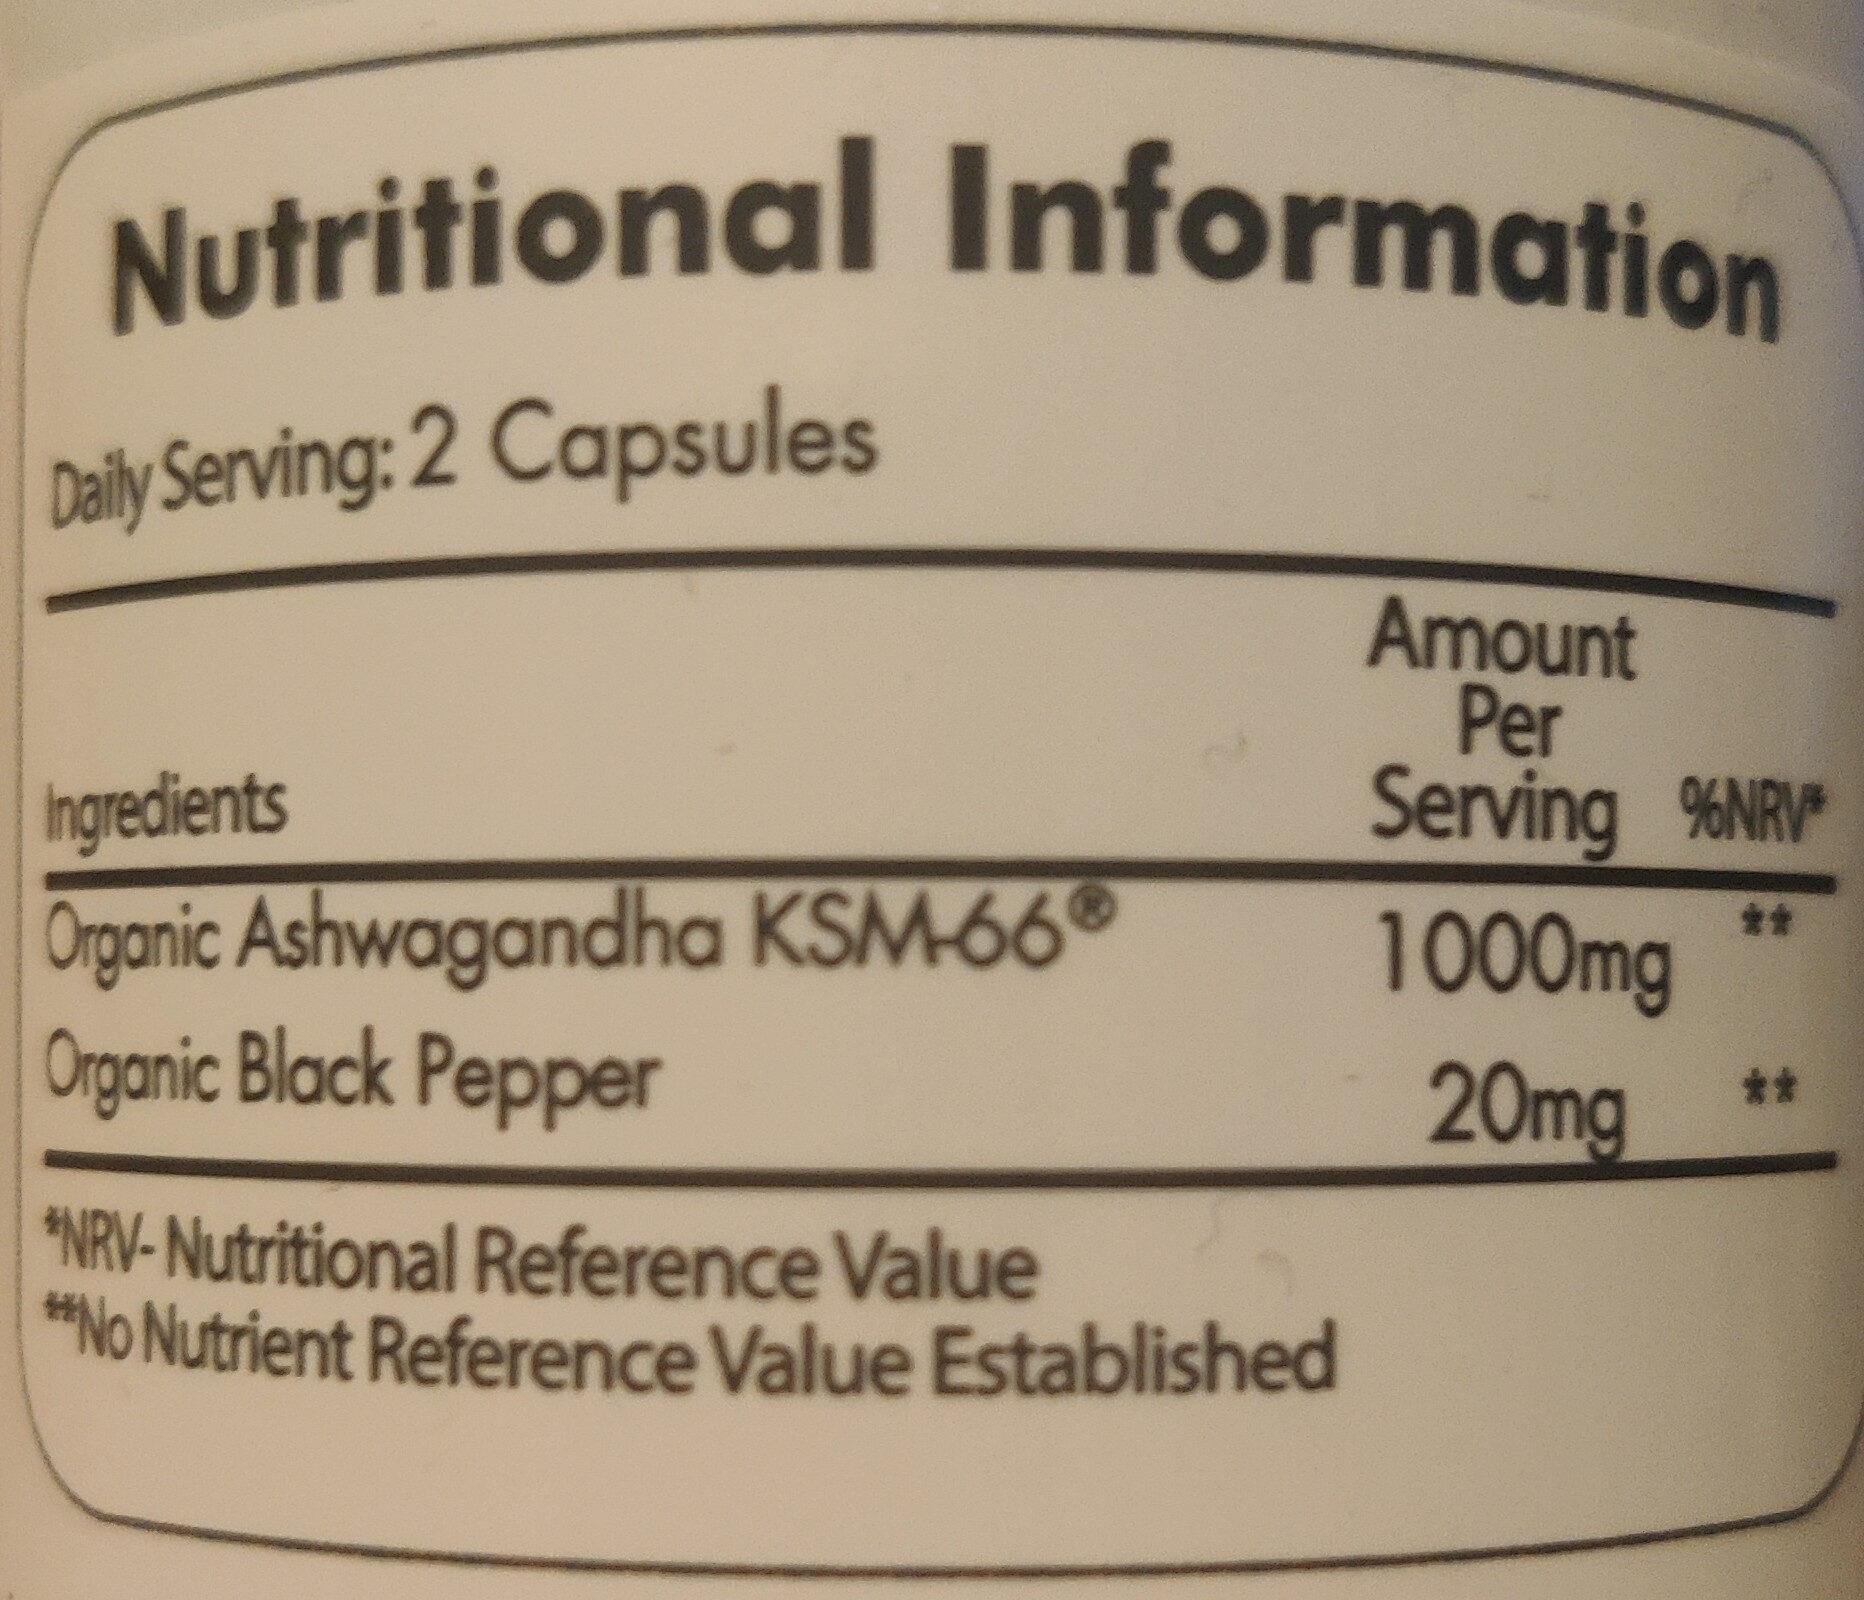 Organic Ashwagandha KSM-66 - Informations nutritionnelles - es